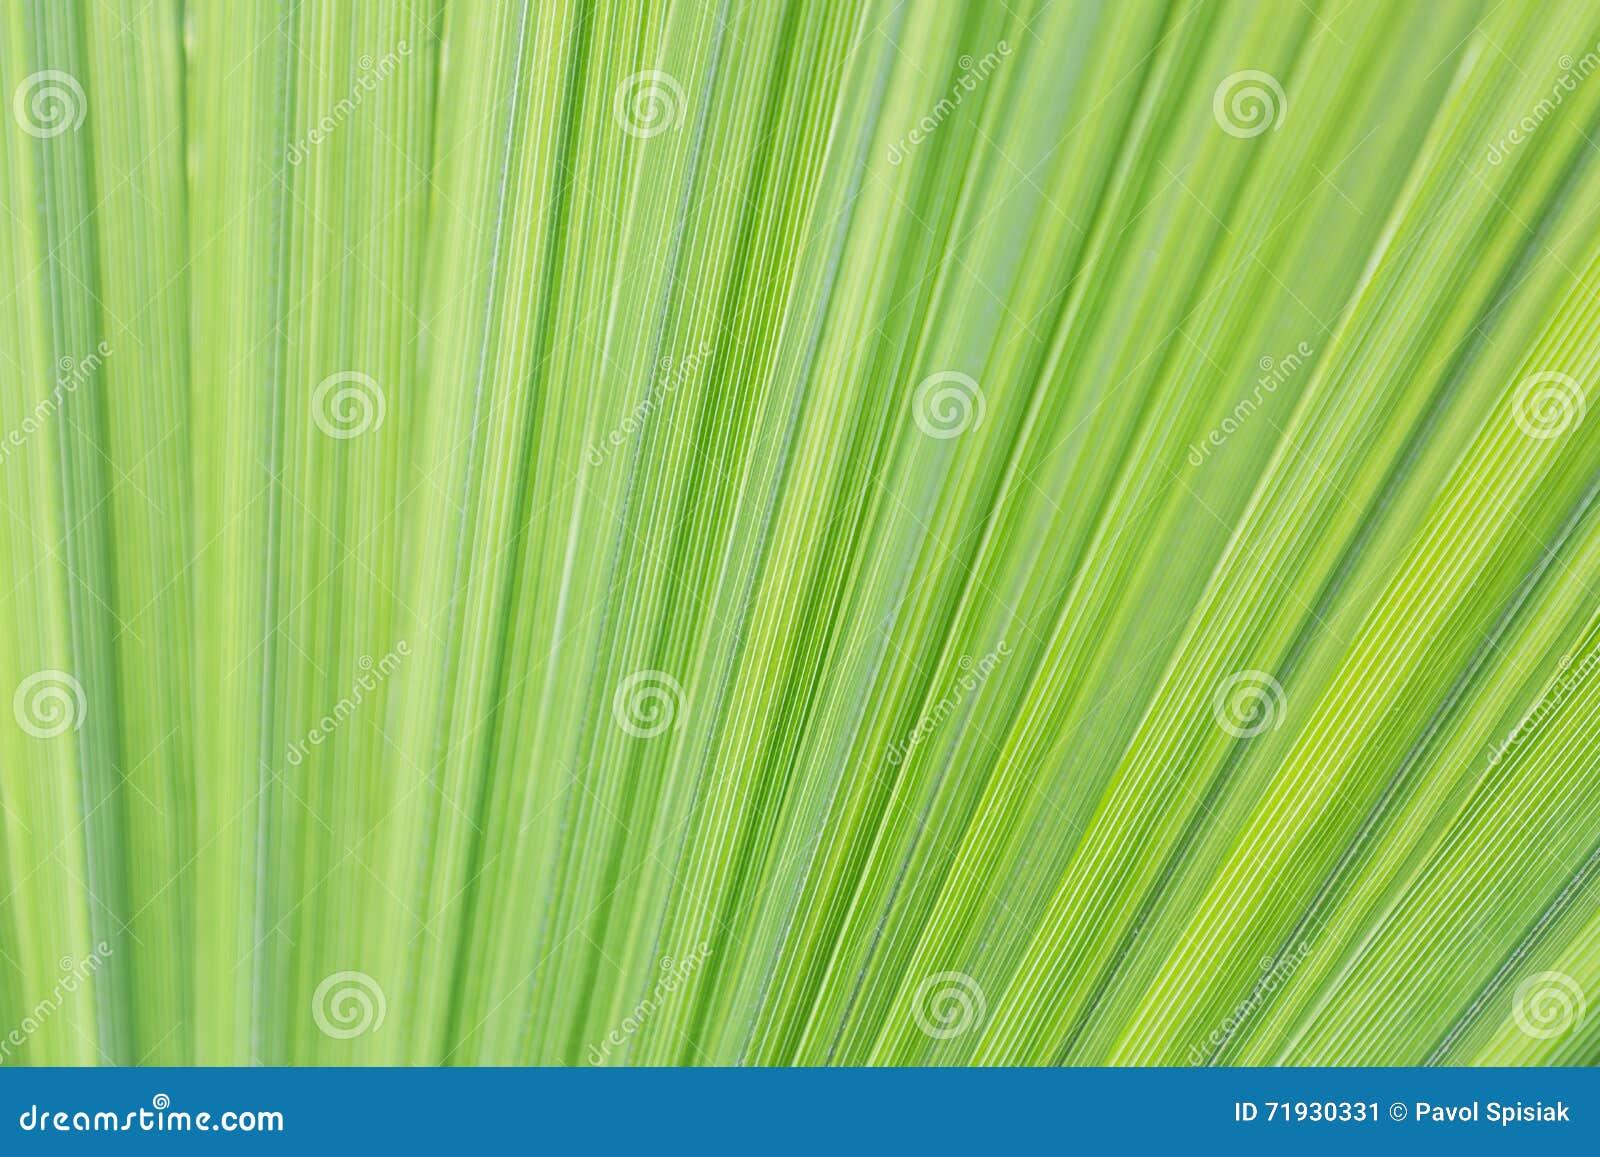 Предпосылка лист ладони